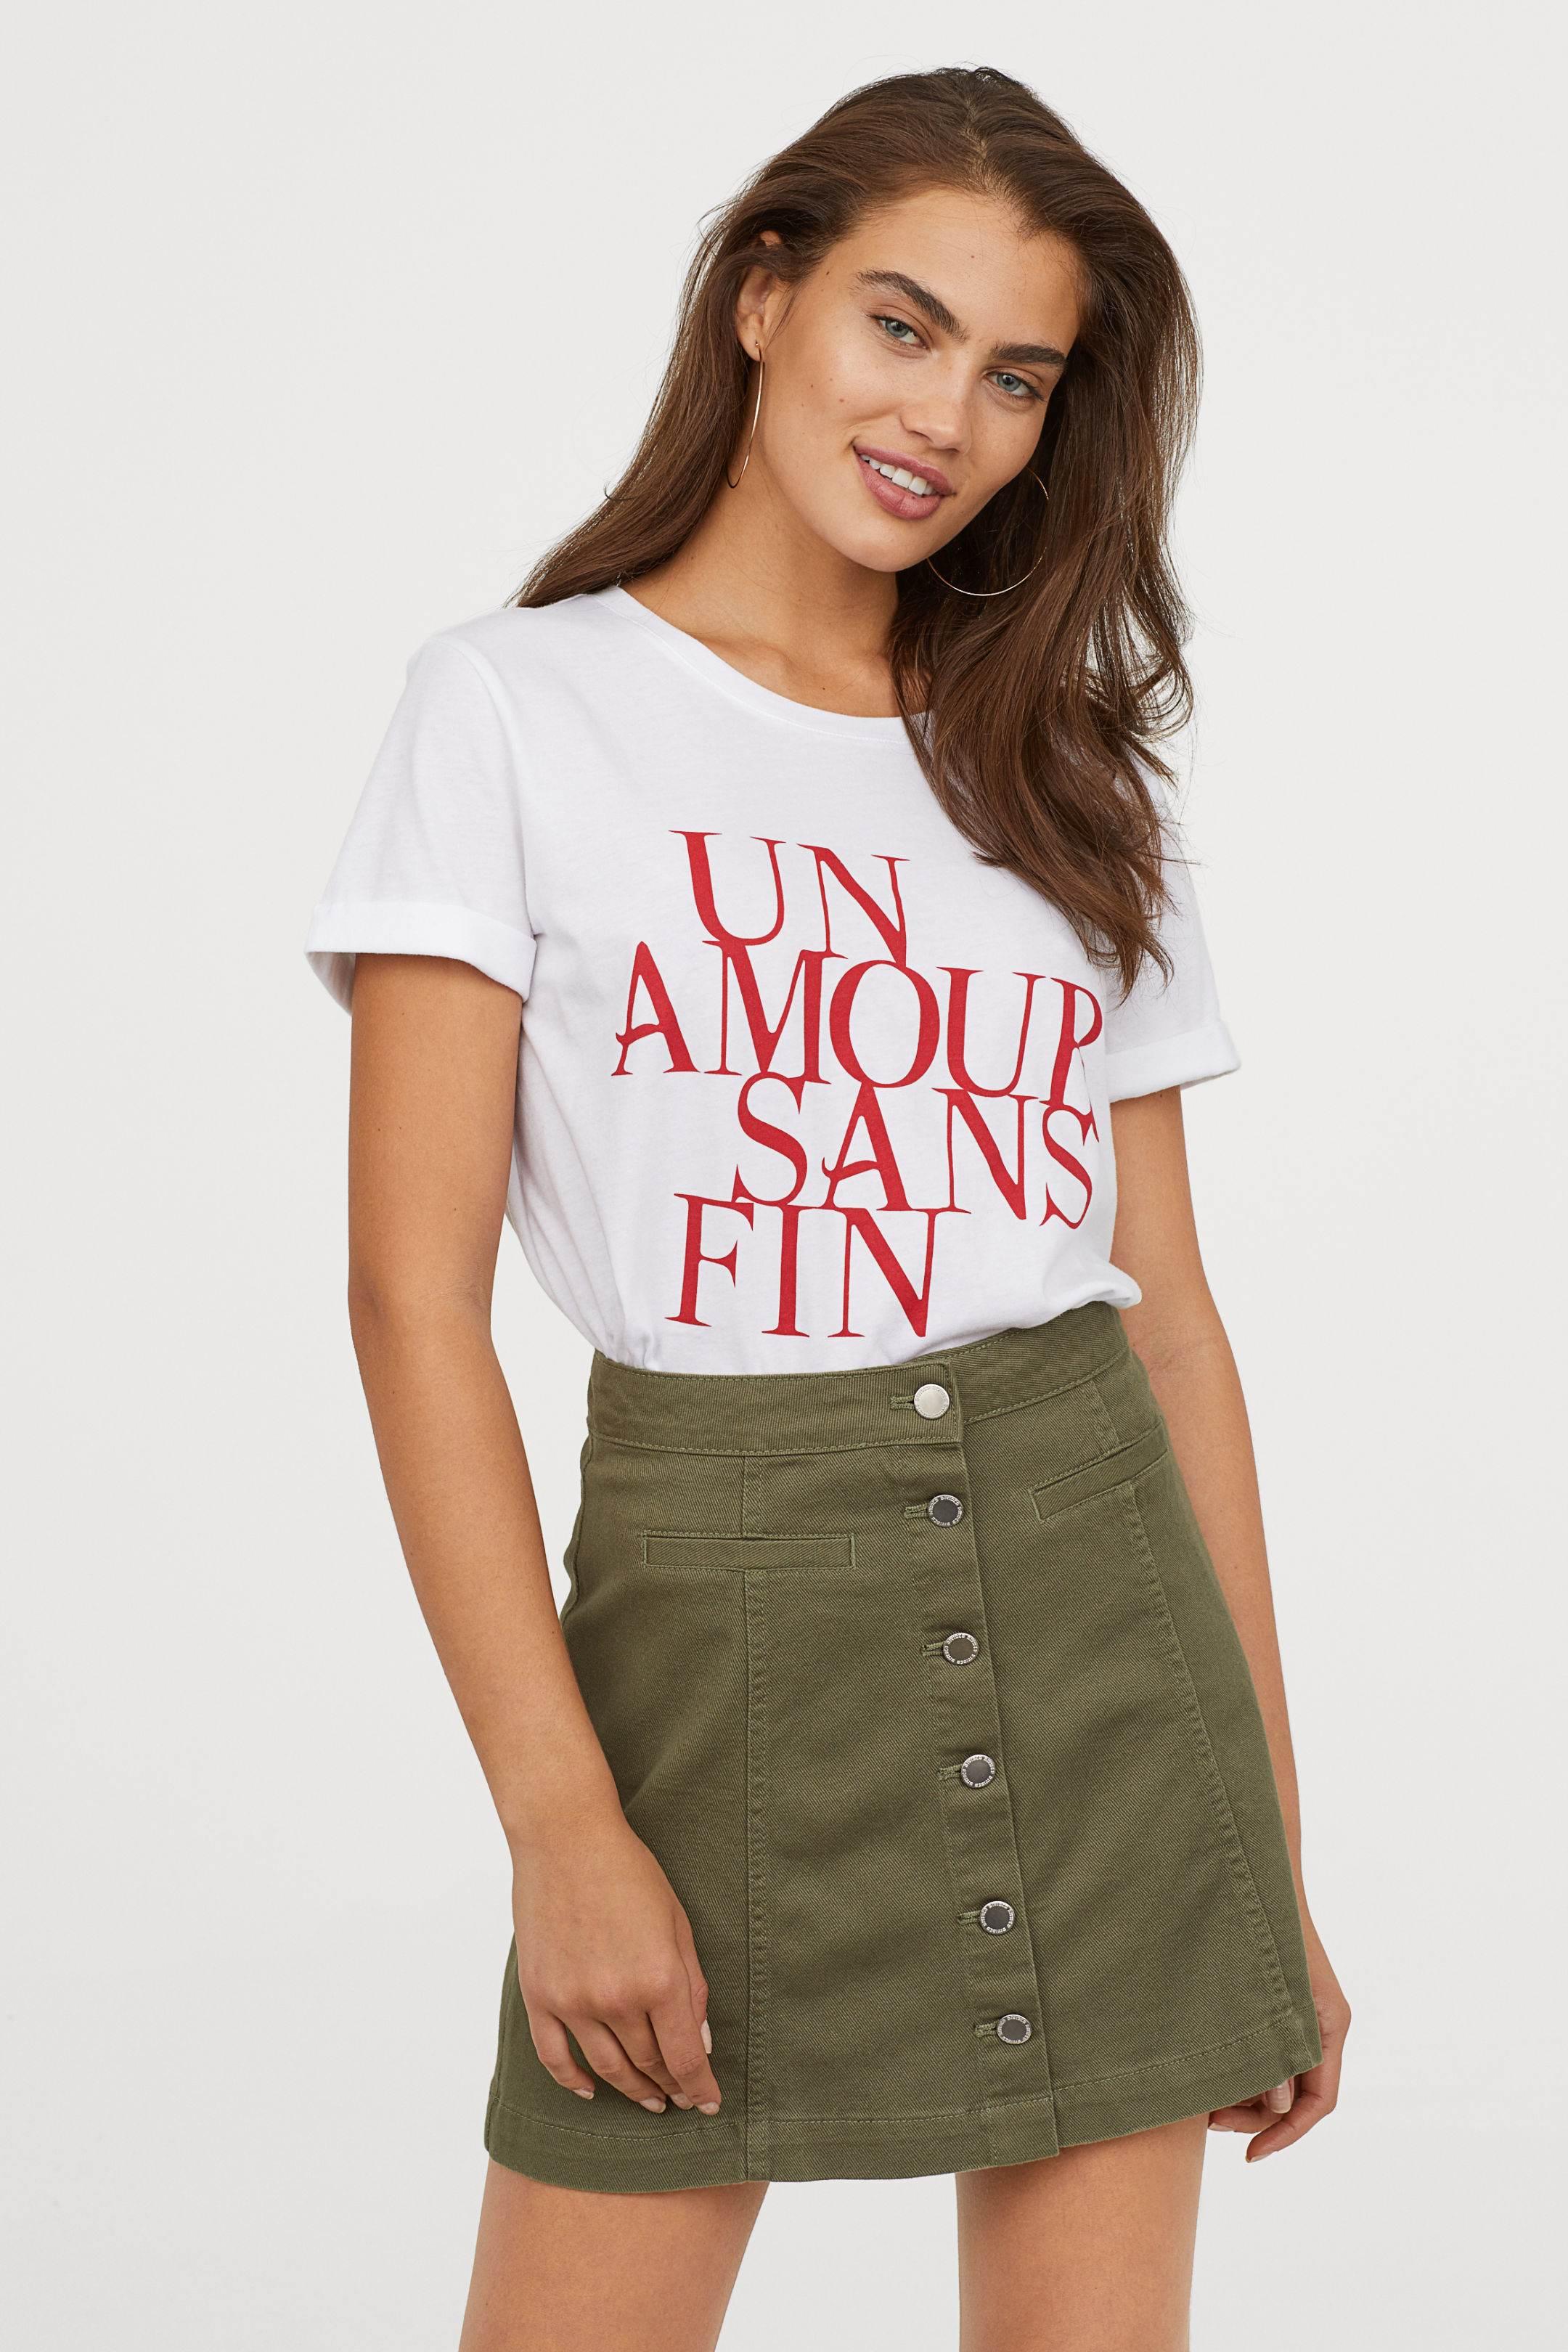 t-shirt trends, H&M, typeface